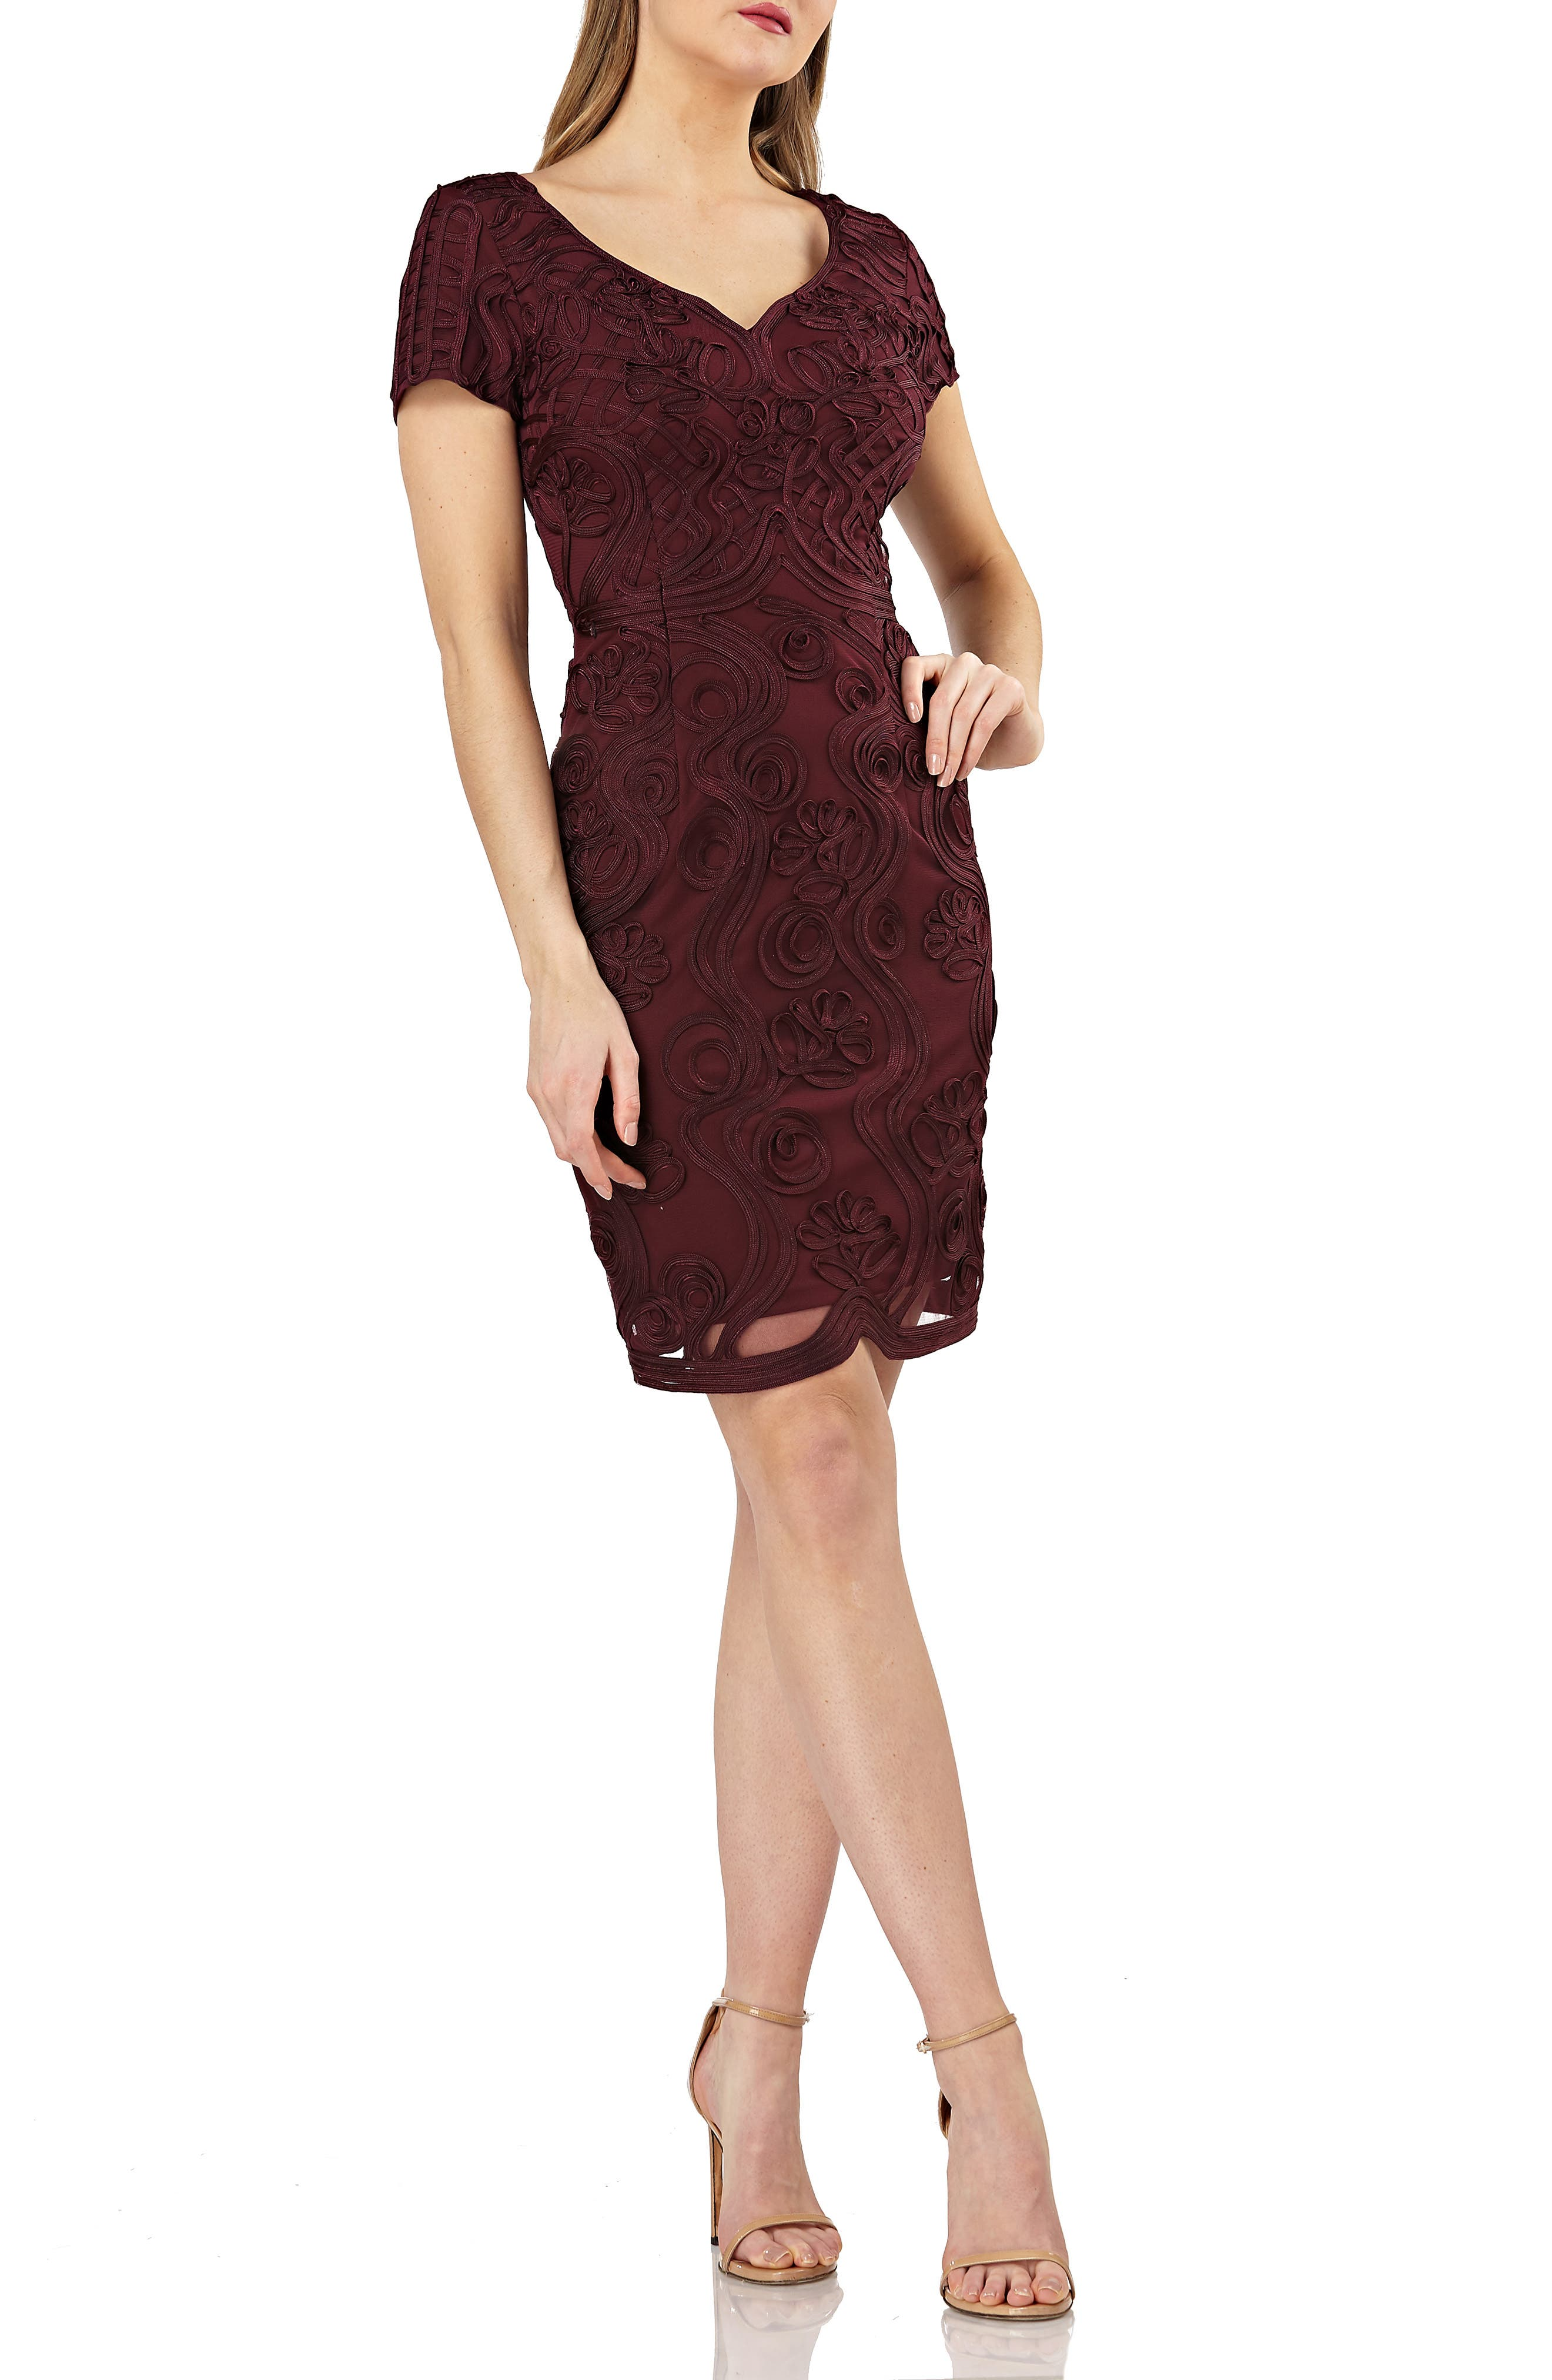 Js Collections Soutache Mesh Sheath Dress, Burgundy